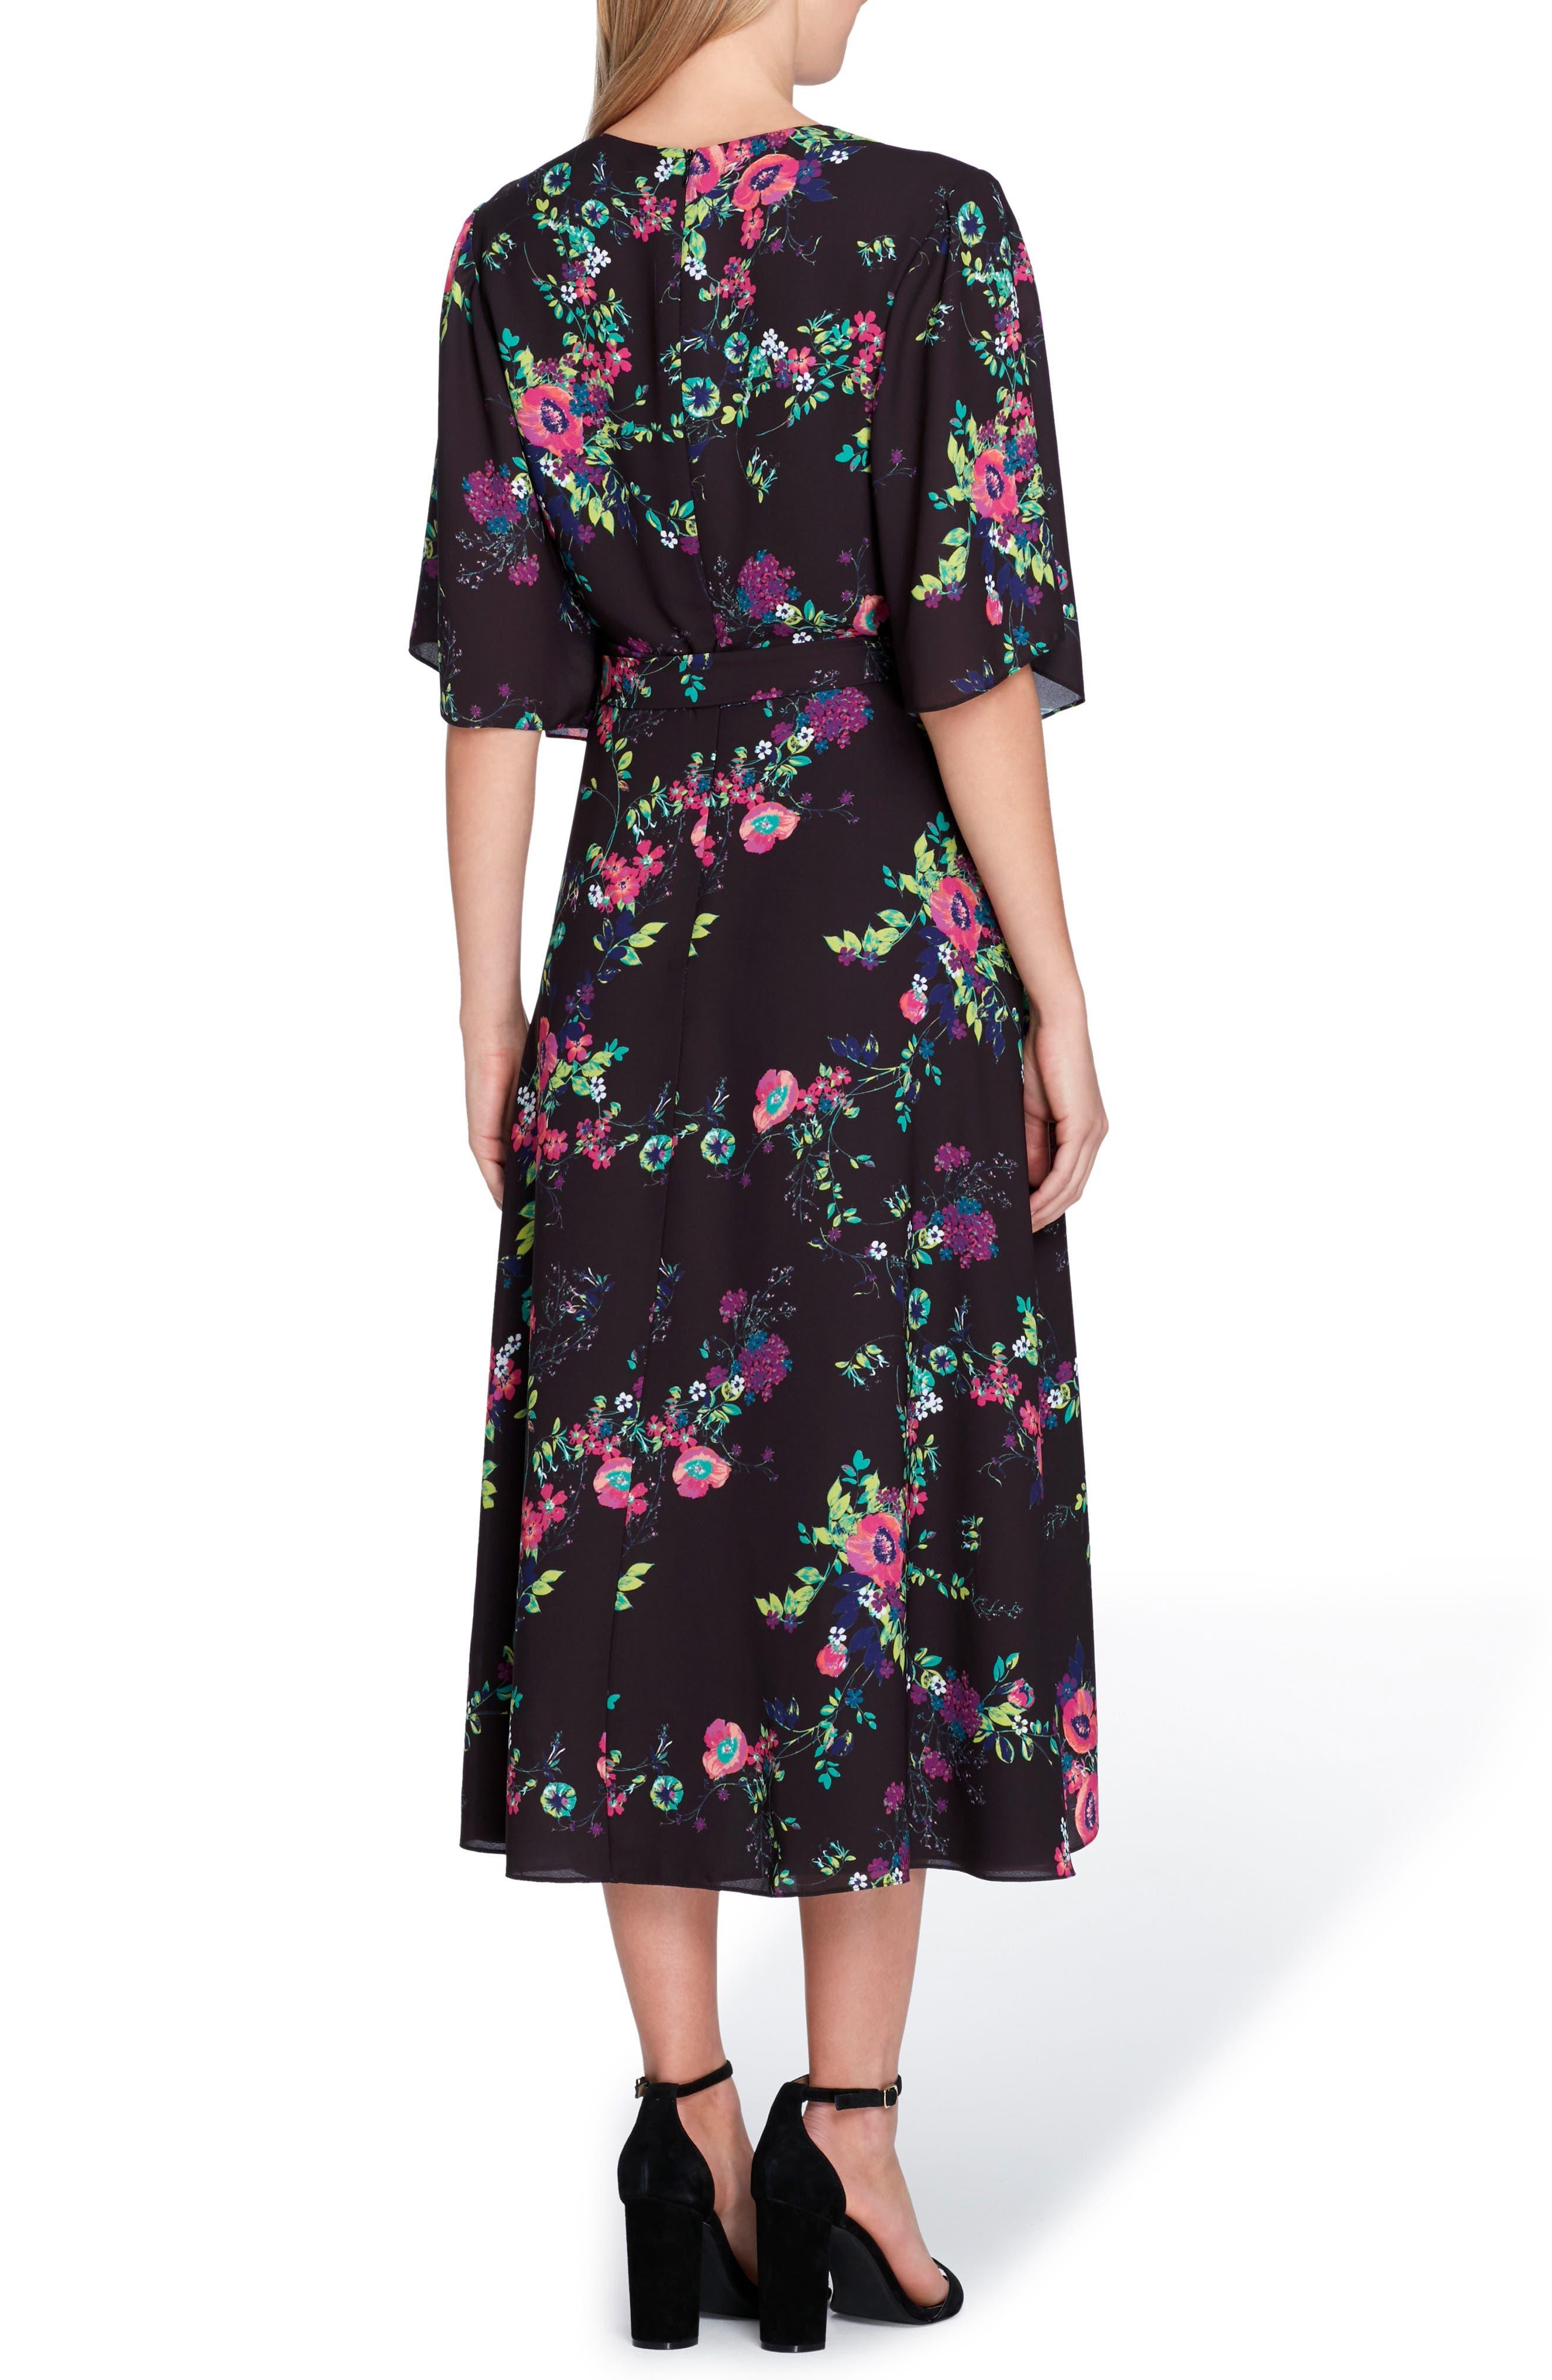 Floral Faux Wrap Midi Dress,                             Alternate thumbnail 2, color,                             Black/ Fuchsia/ Green